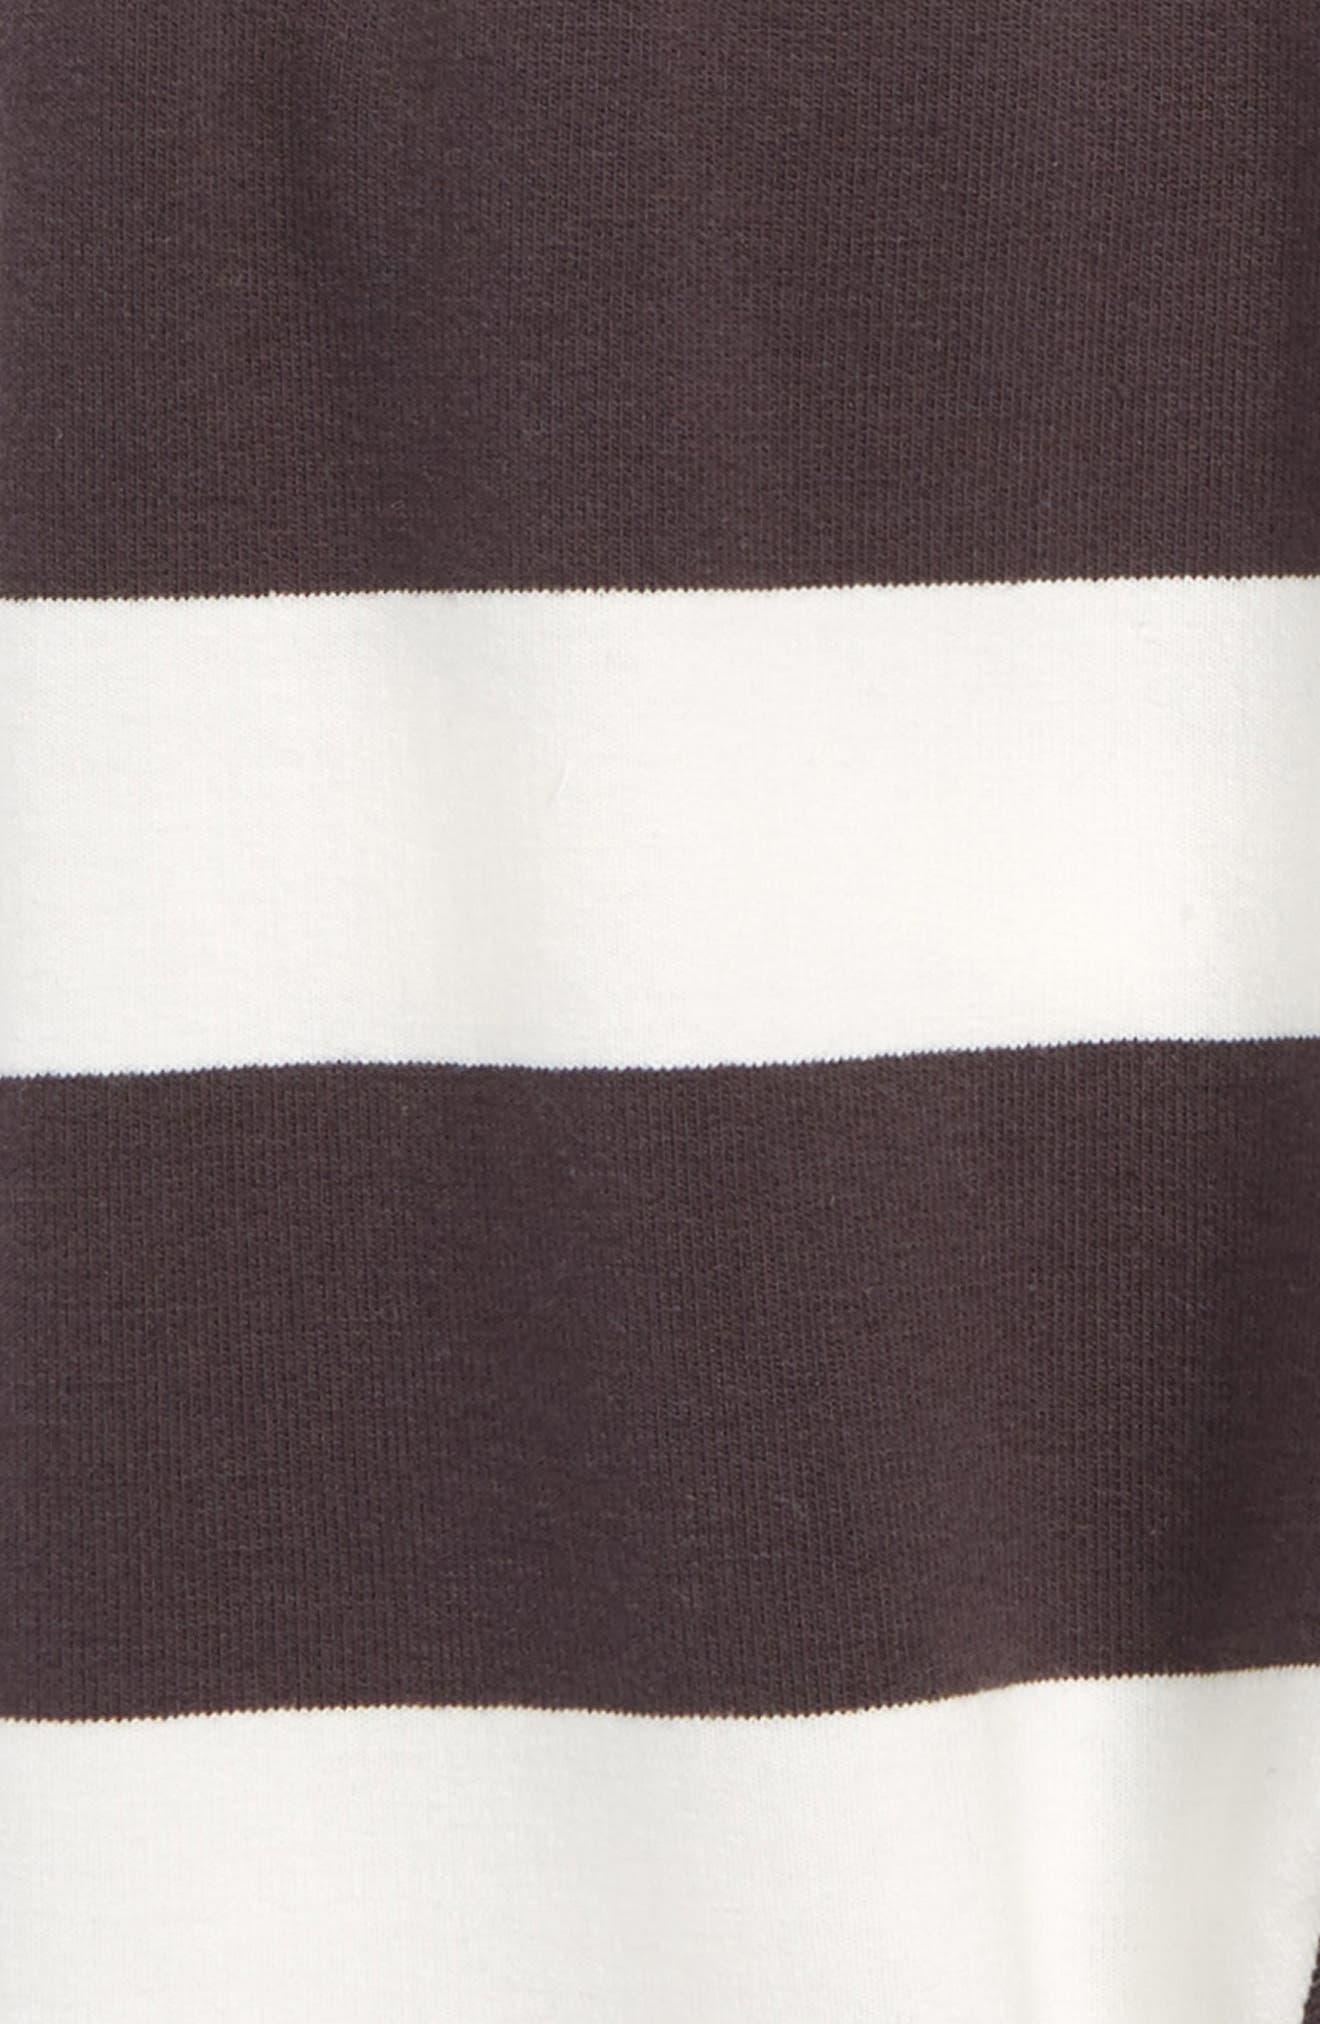 Stripe Sweatpants,                             Alternate thumbnail 2, color,                             021